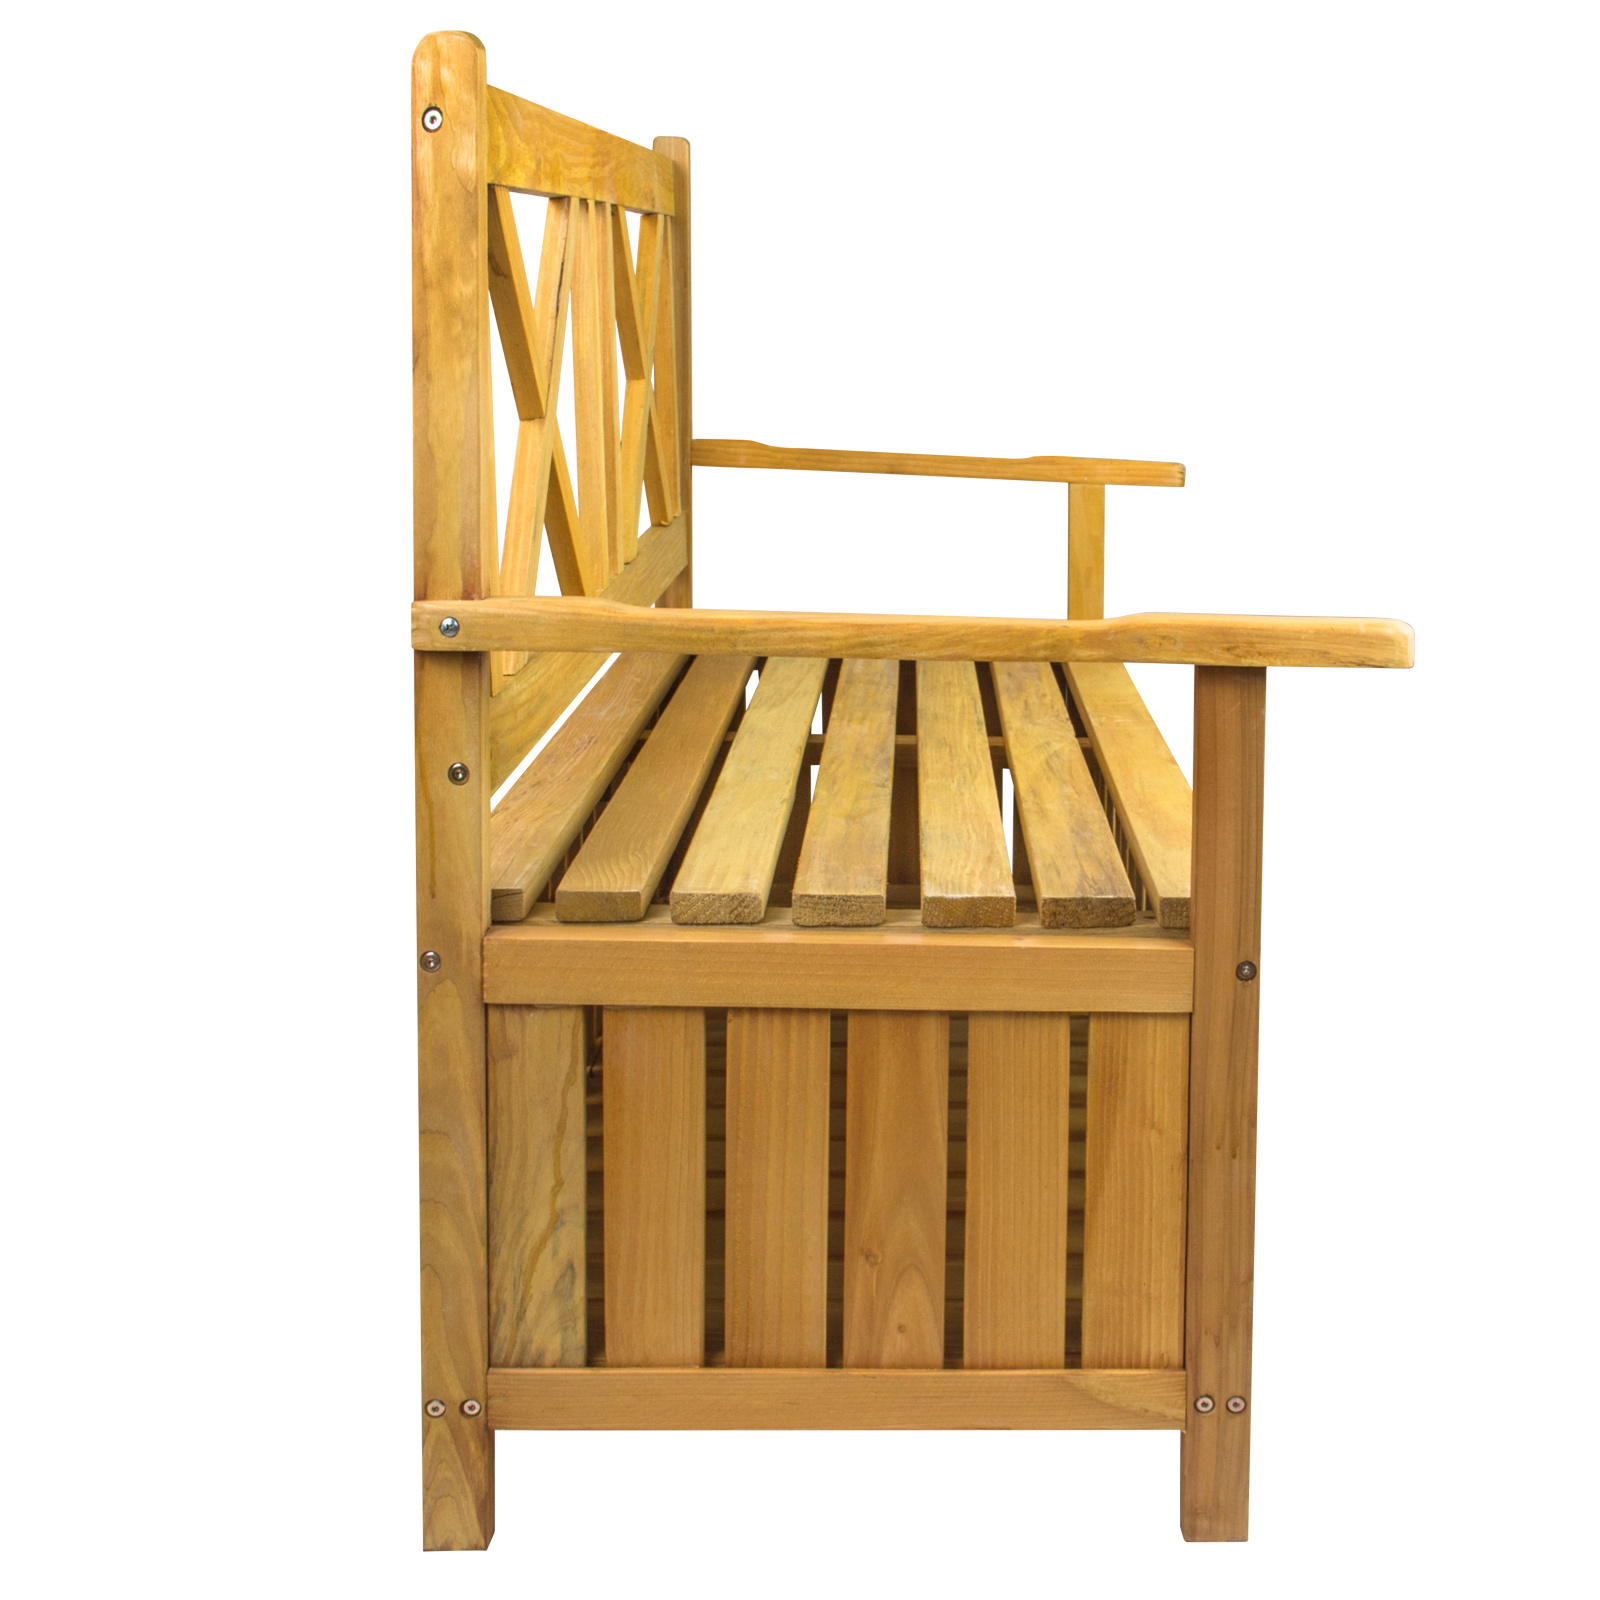 garten holz truhenbank bank gartenbank mit truhe stauraum kiefernholz 115x58x86 ebay. Black Bedroom Furniture Sets. Home Design Ideas